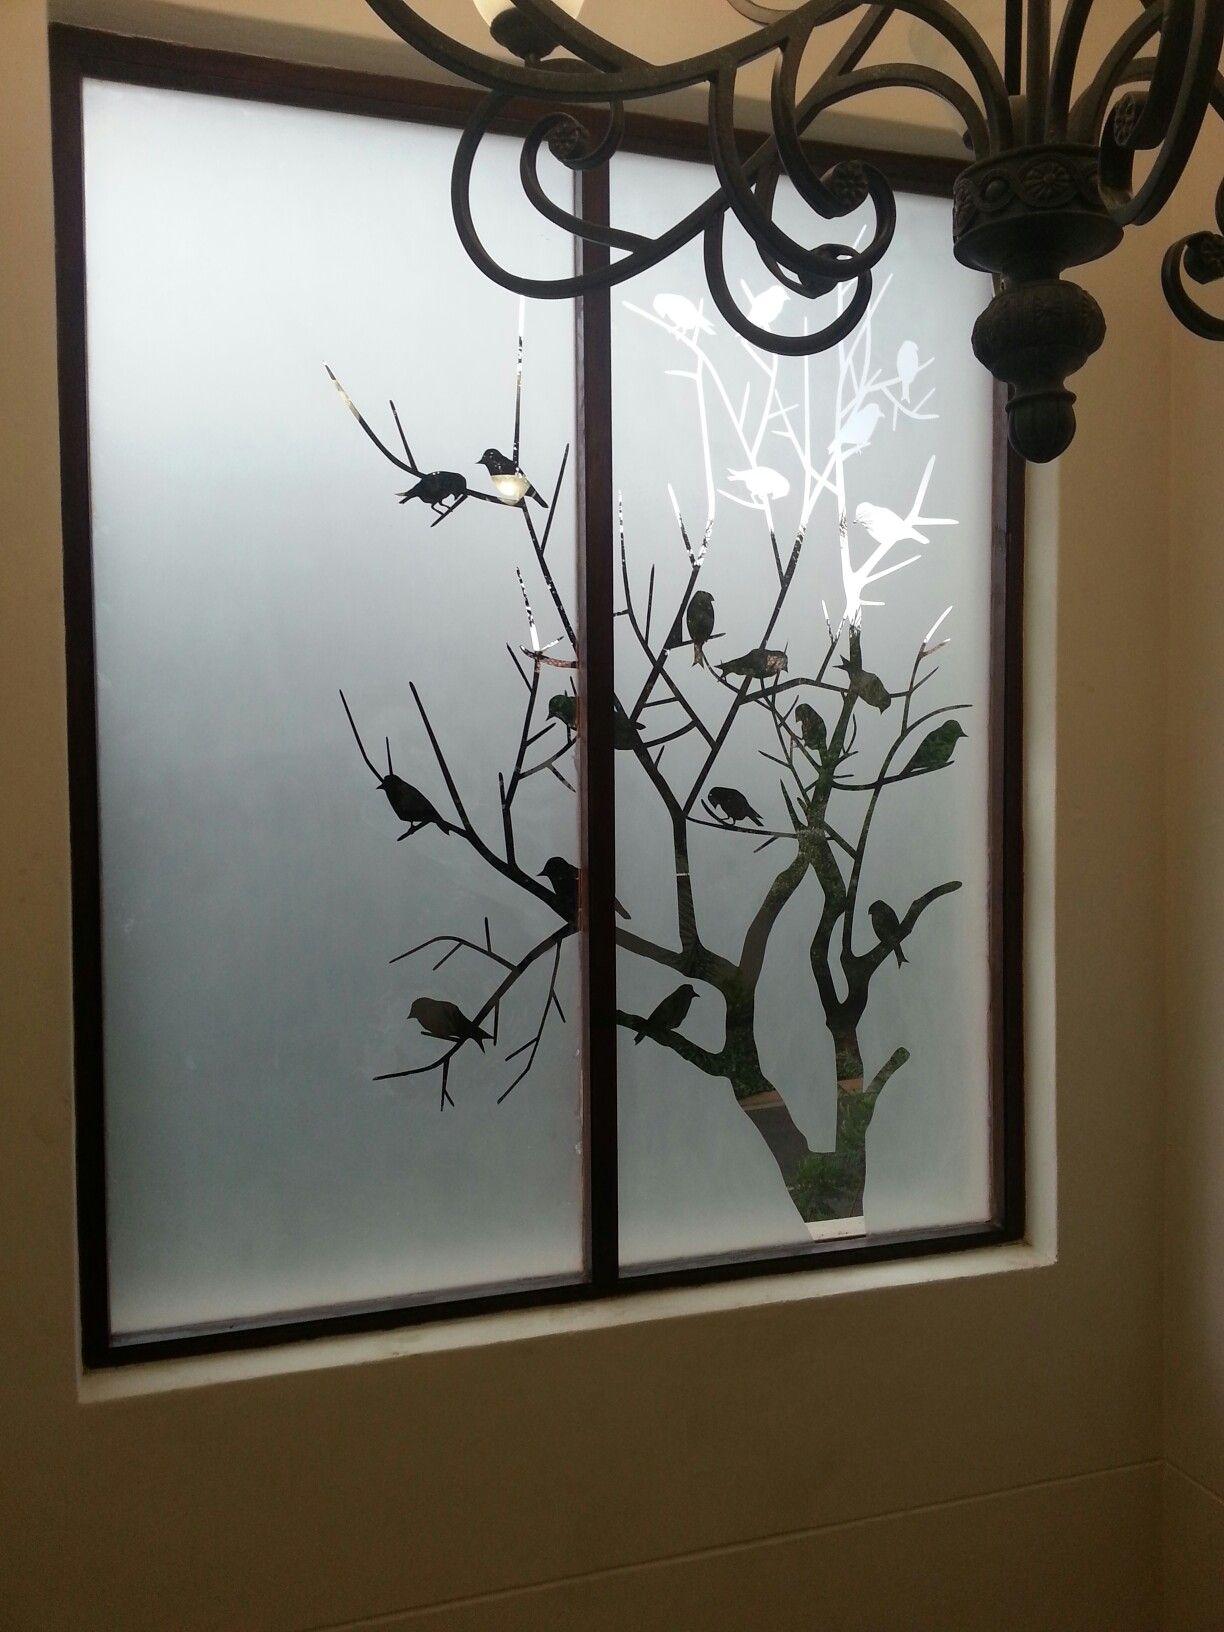 Hp sandblast birds in a tree design hp sandblast for Glass etching designs for doors